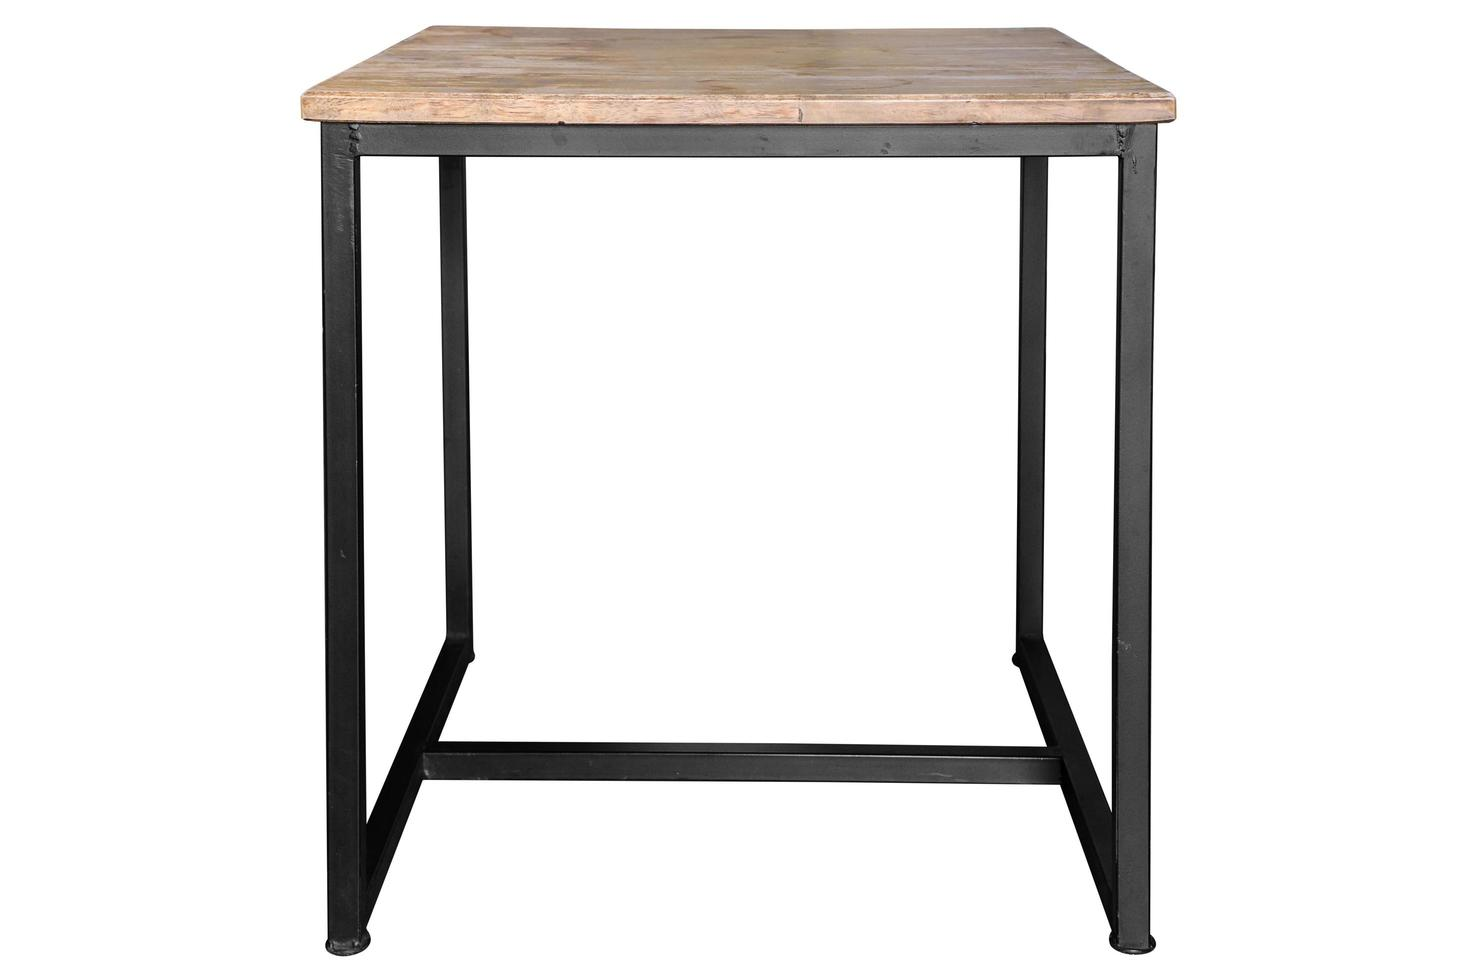 Mesa de madera moderna con patas de acero sobre fondo blanco. foto